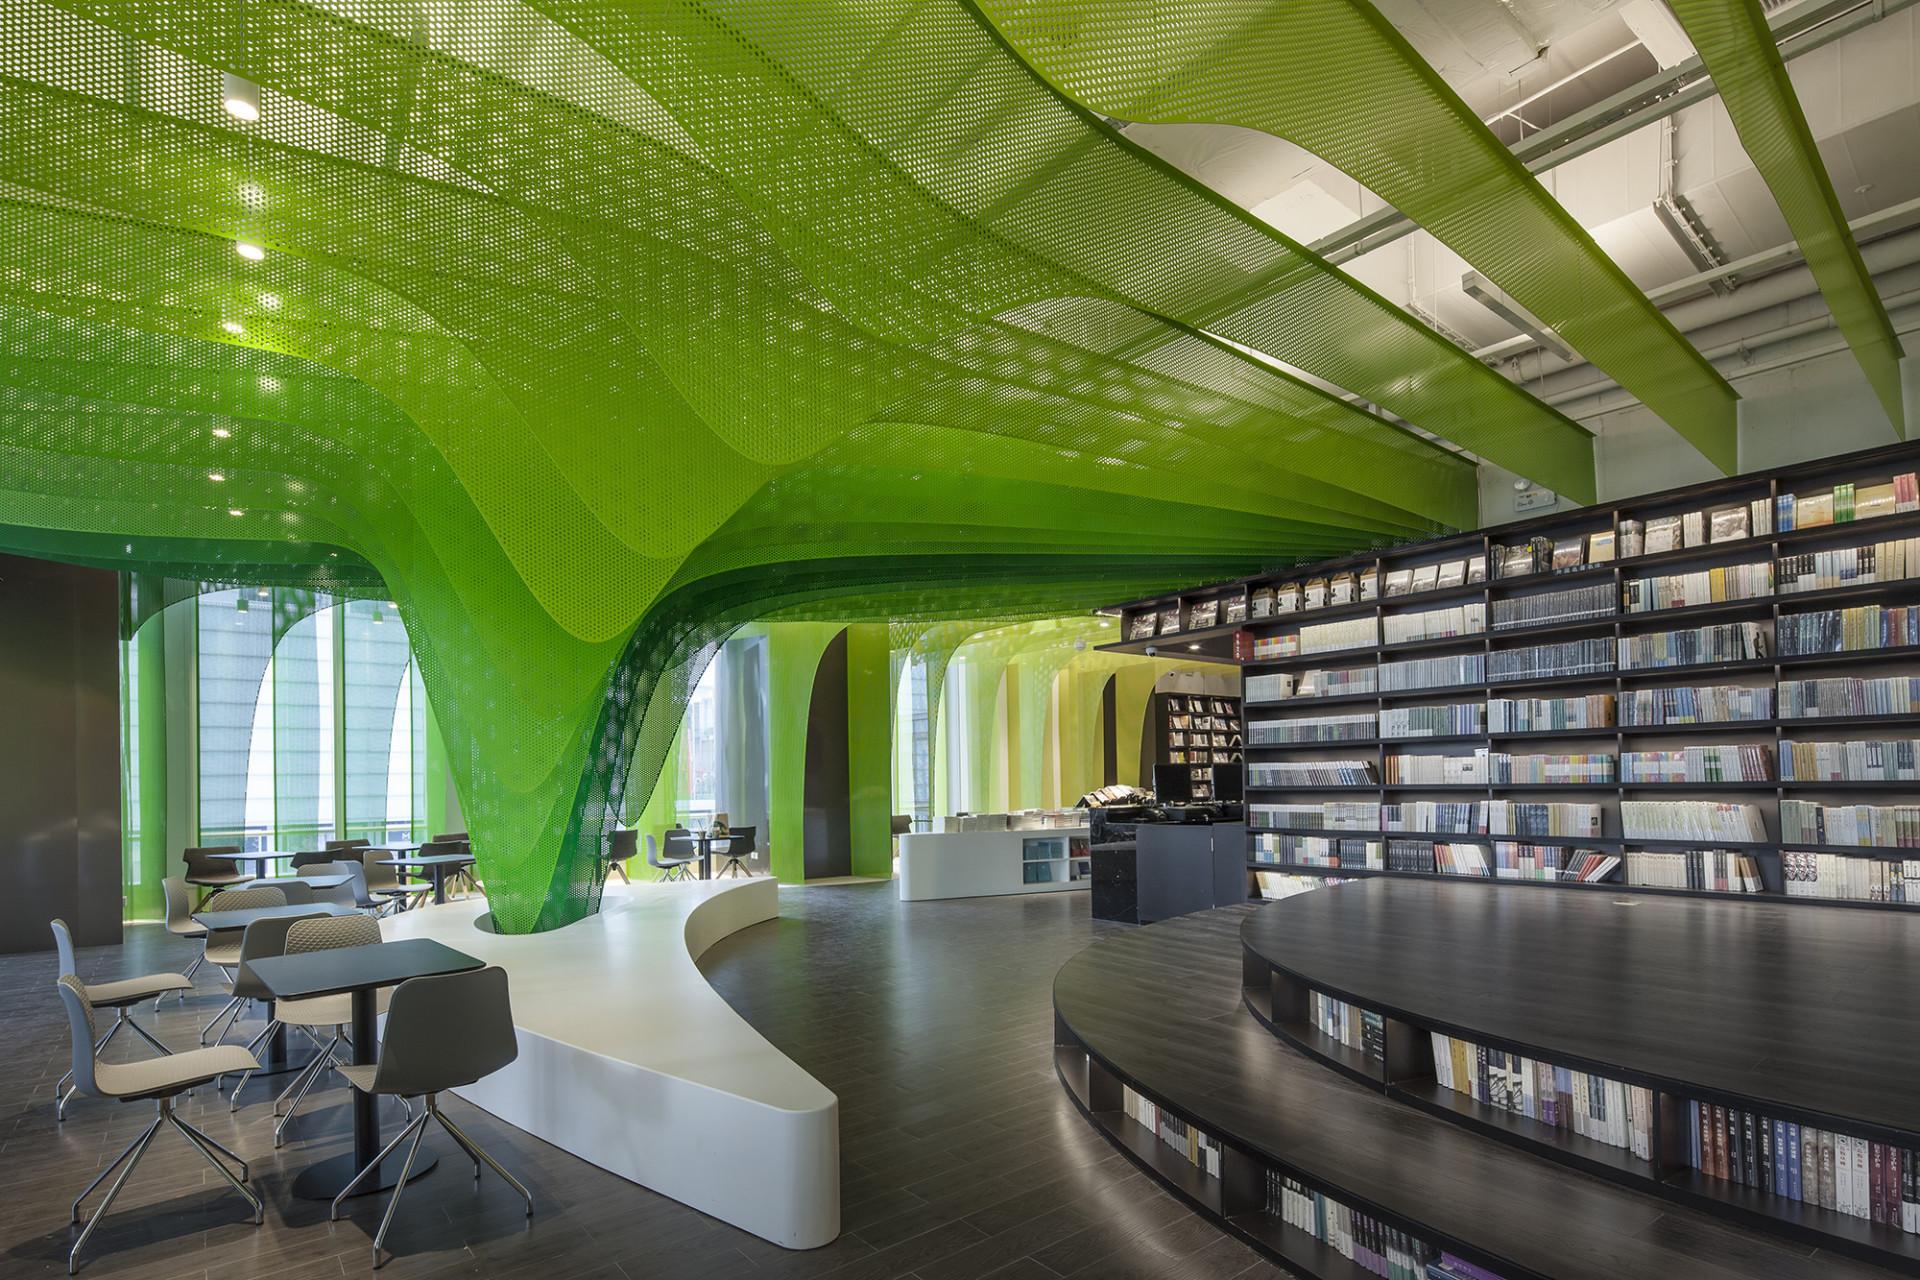 Библиотека в Сучжоу